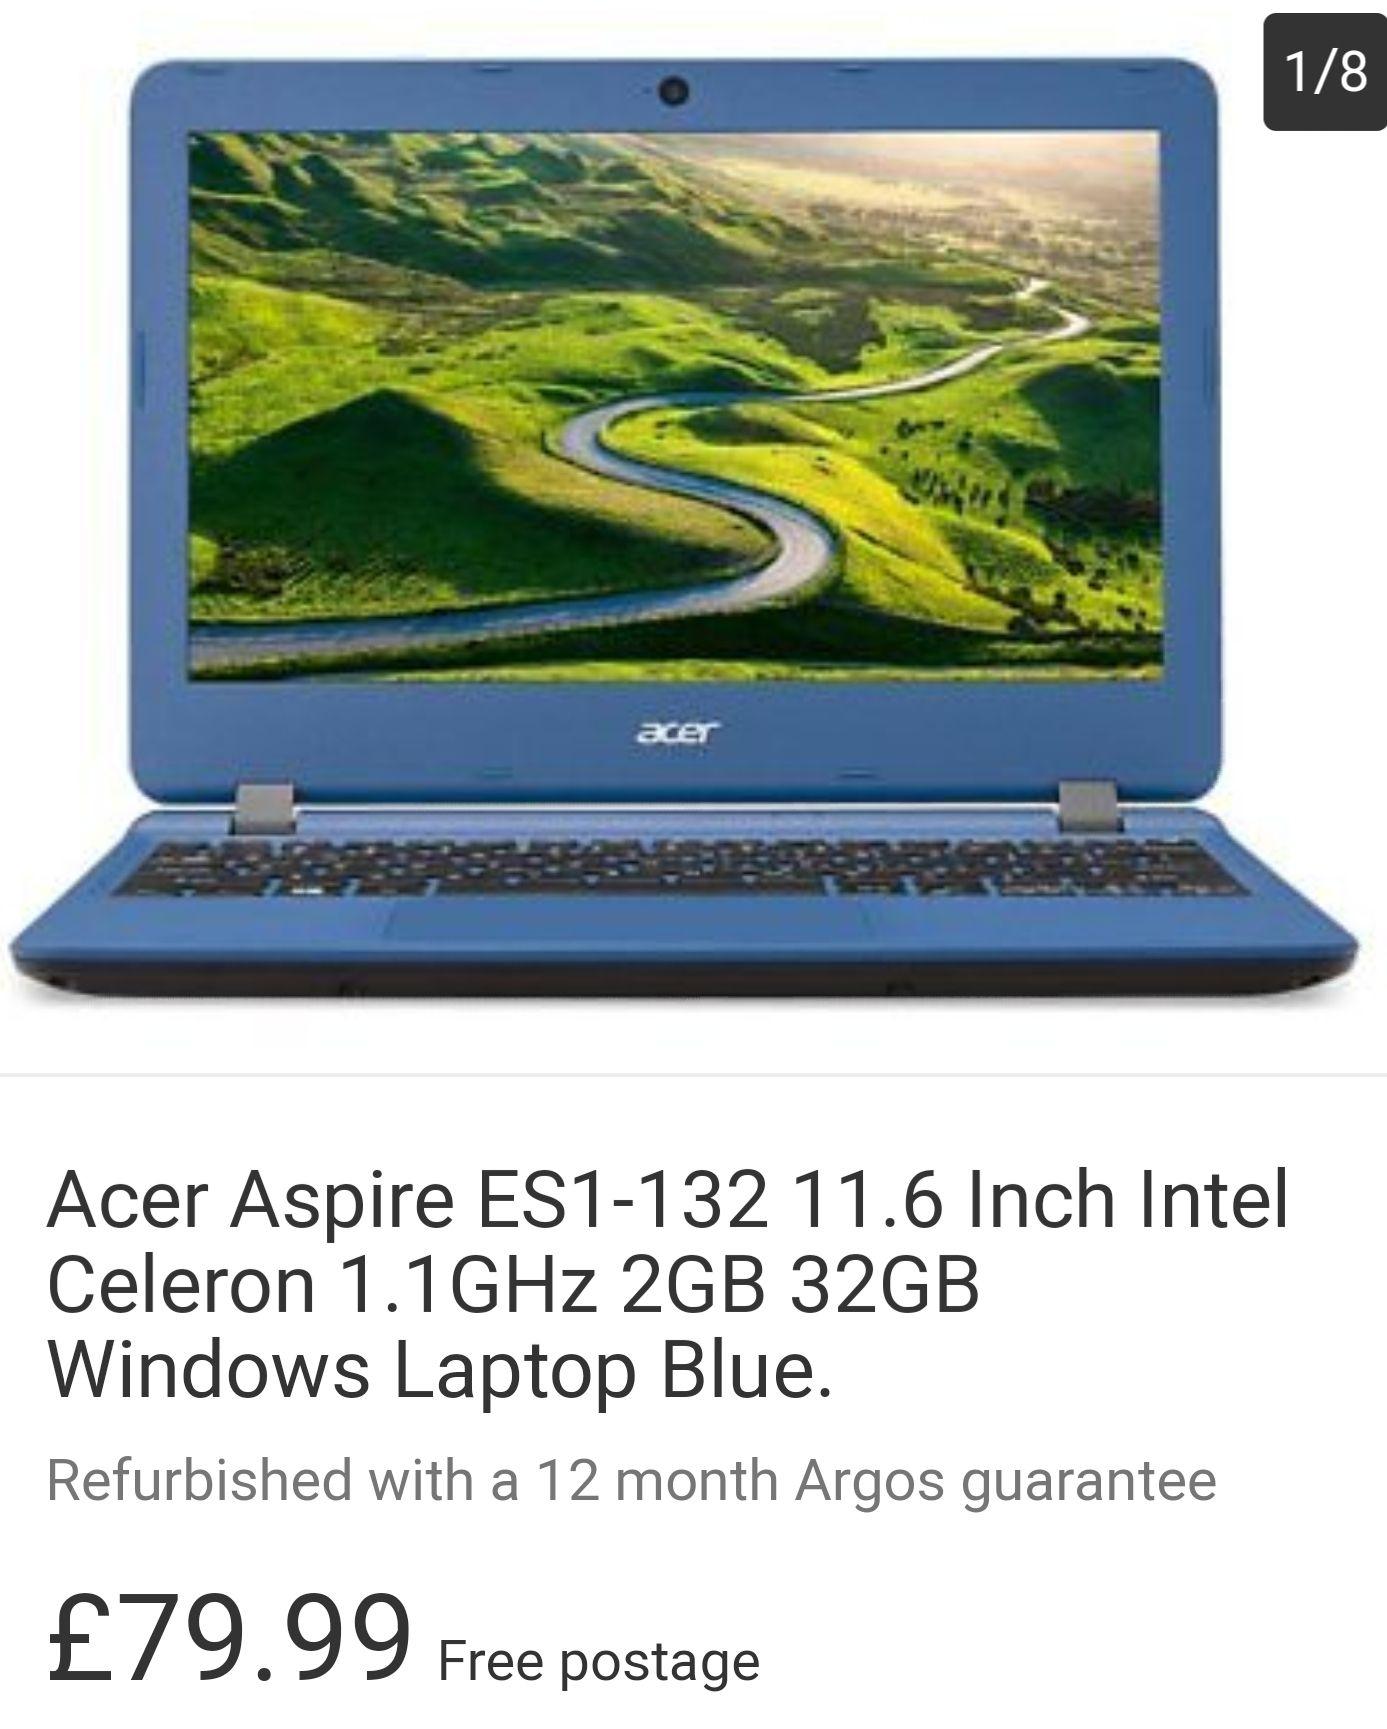 Refurbished Acer Aspire ES1-132 11.6 Inch Intel Celeron 1.1GHz 2GB 32GB Windows Laptop Blue £79.99 at Argos / eBay